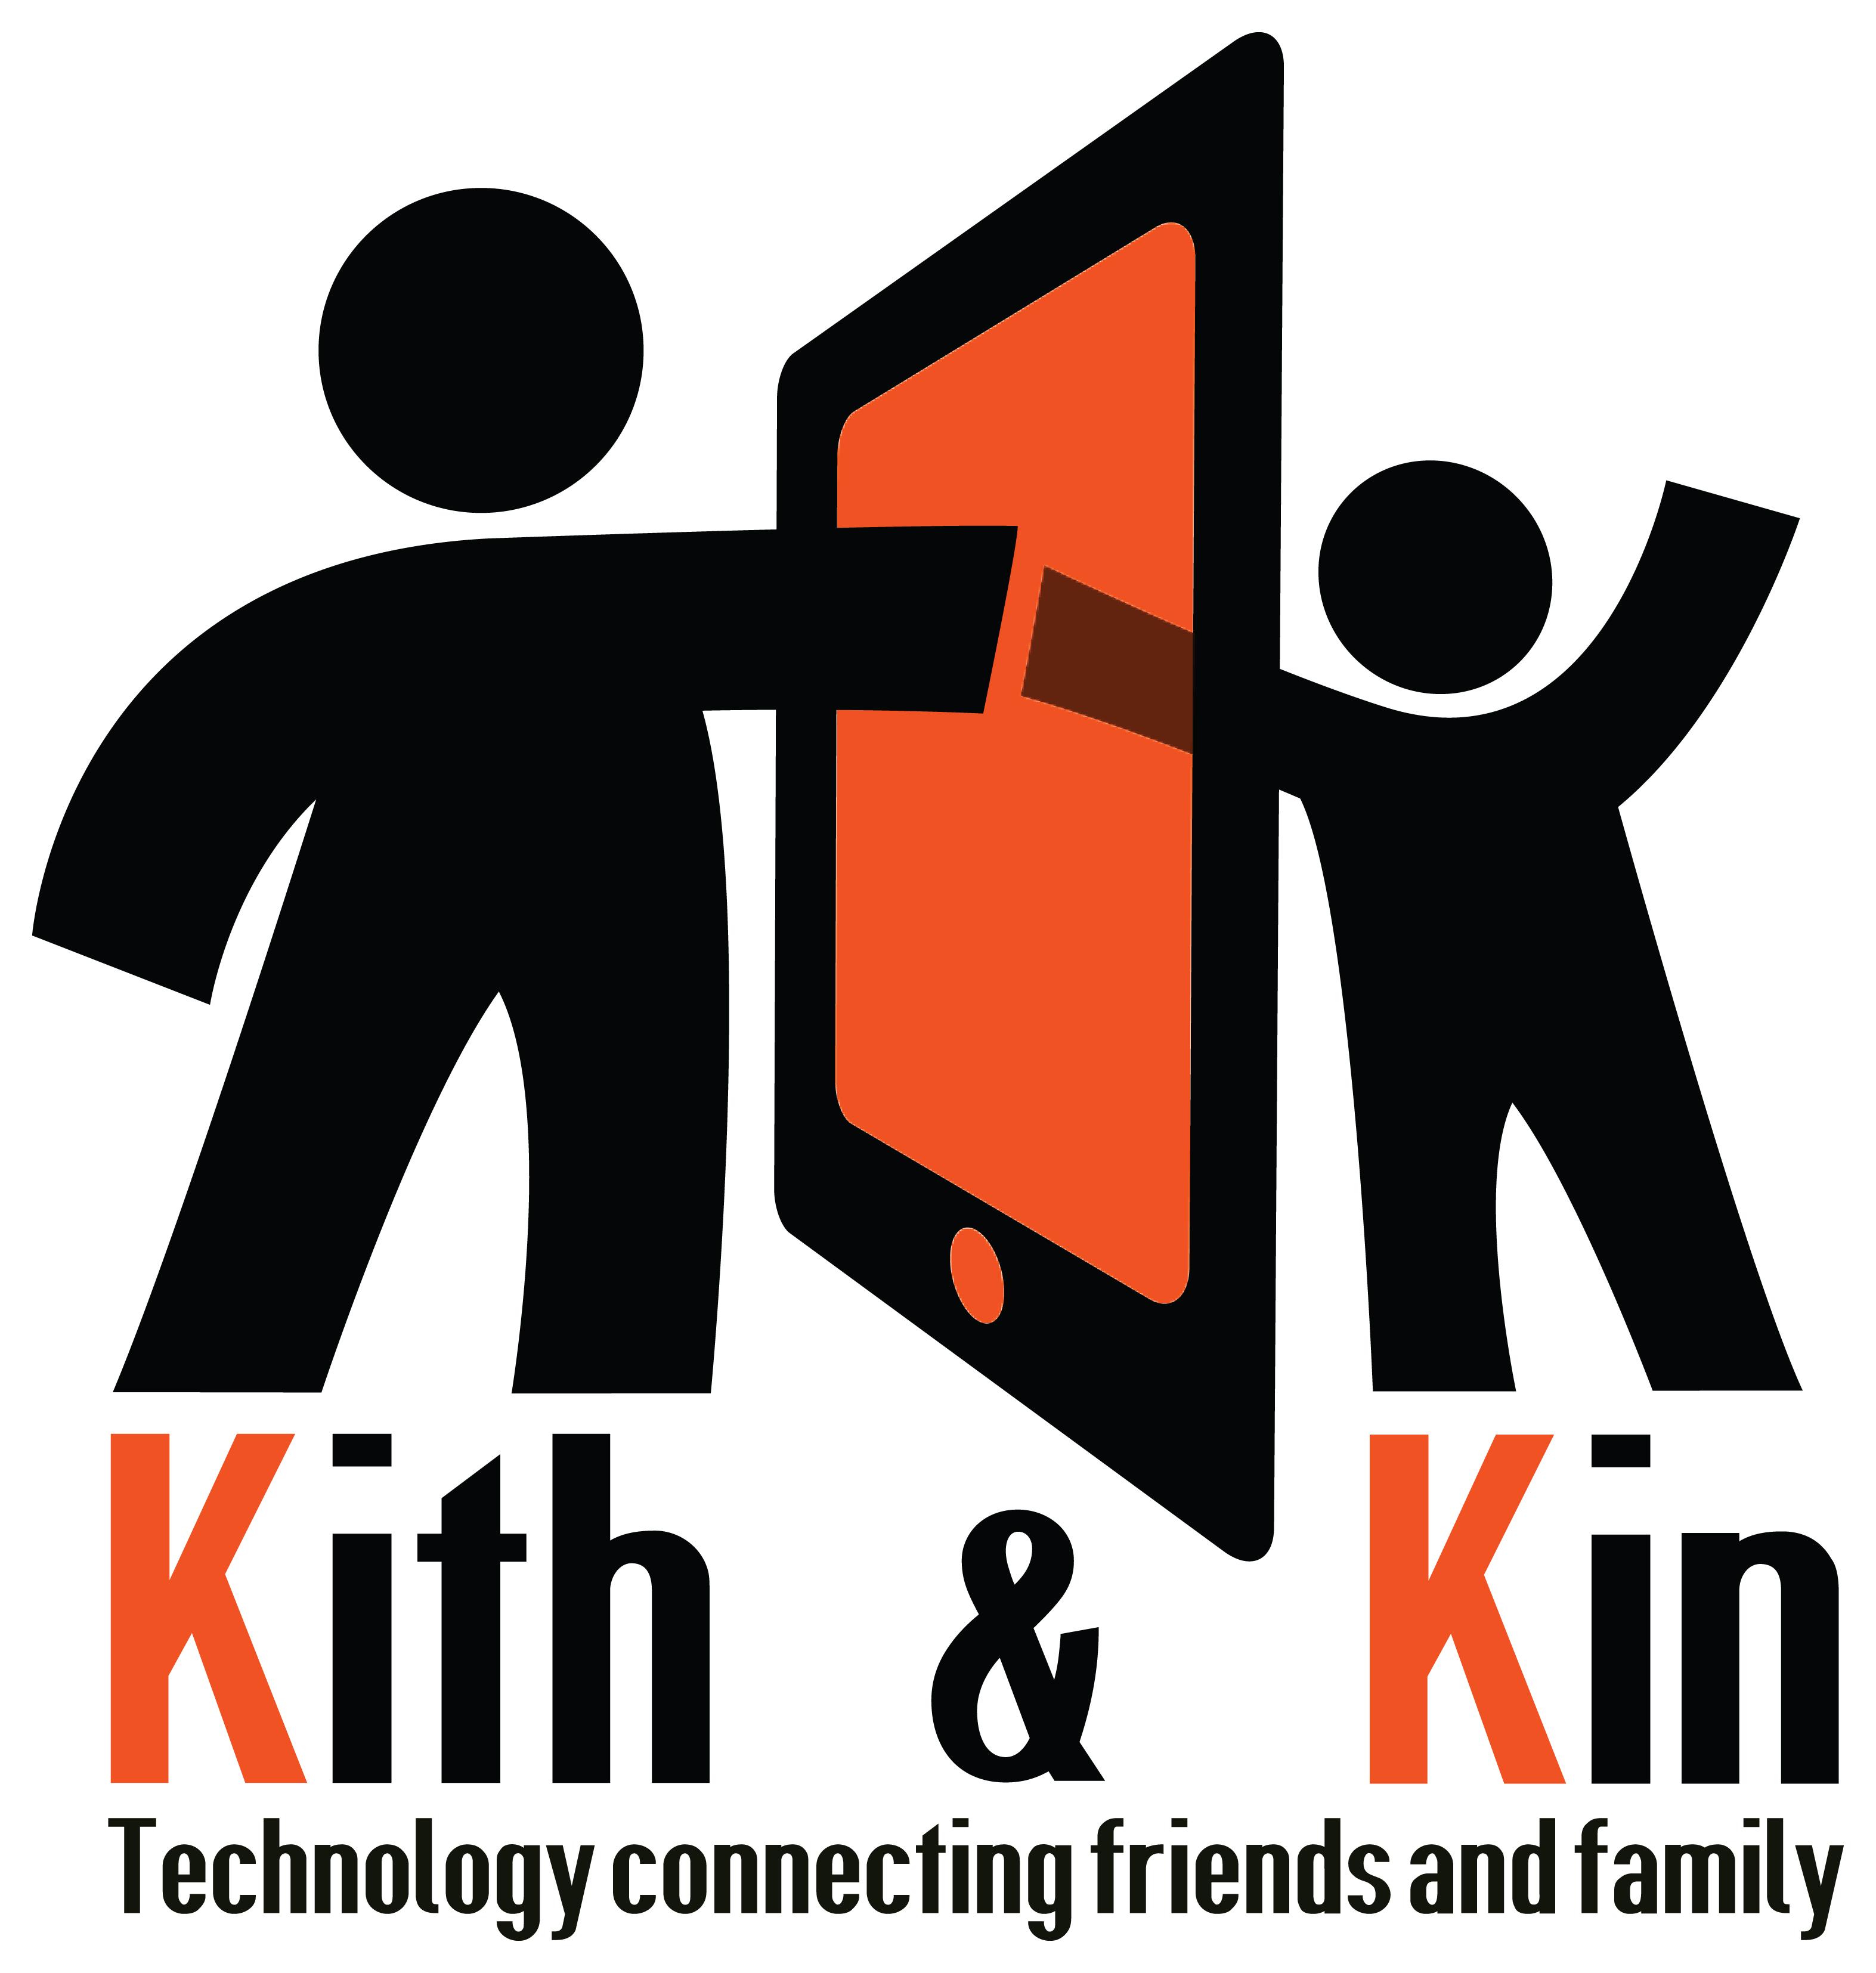 Kith&Kin